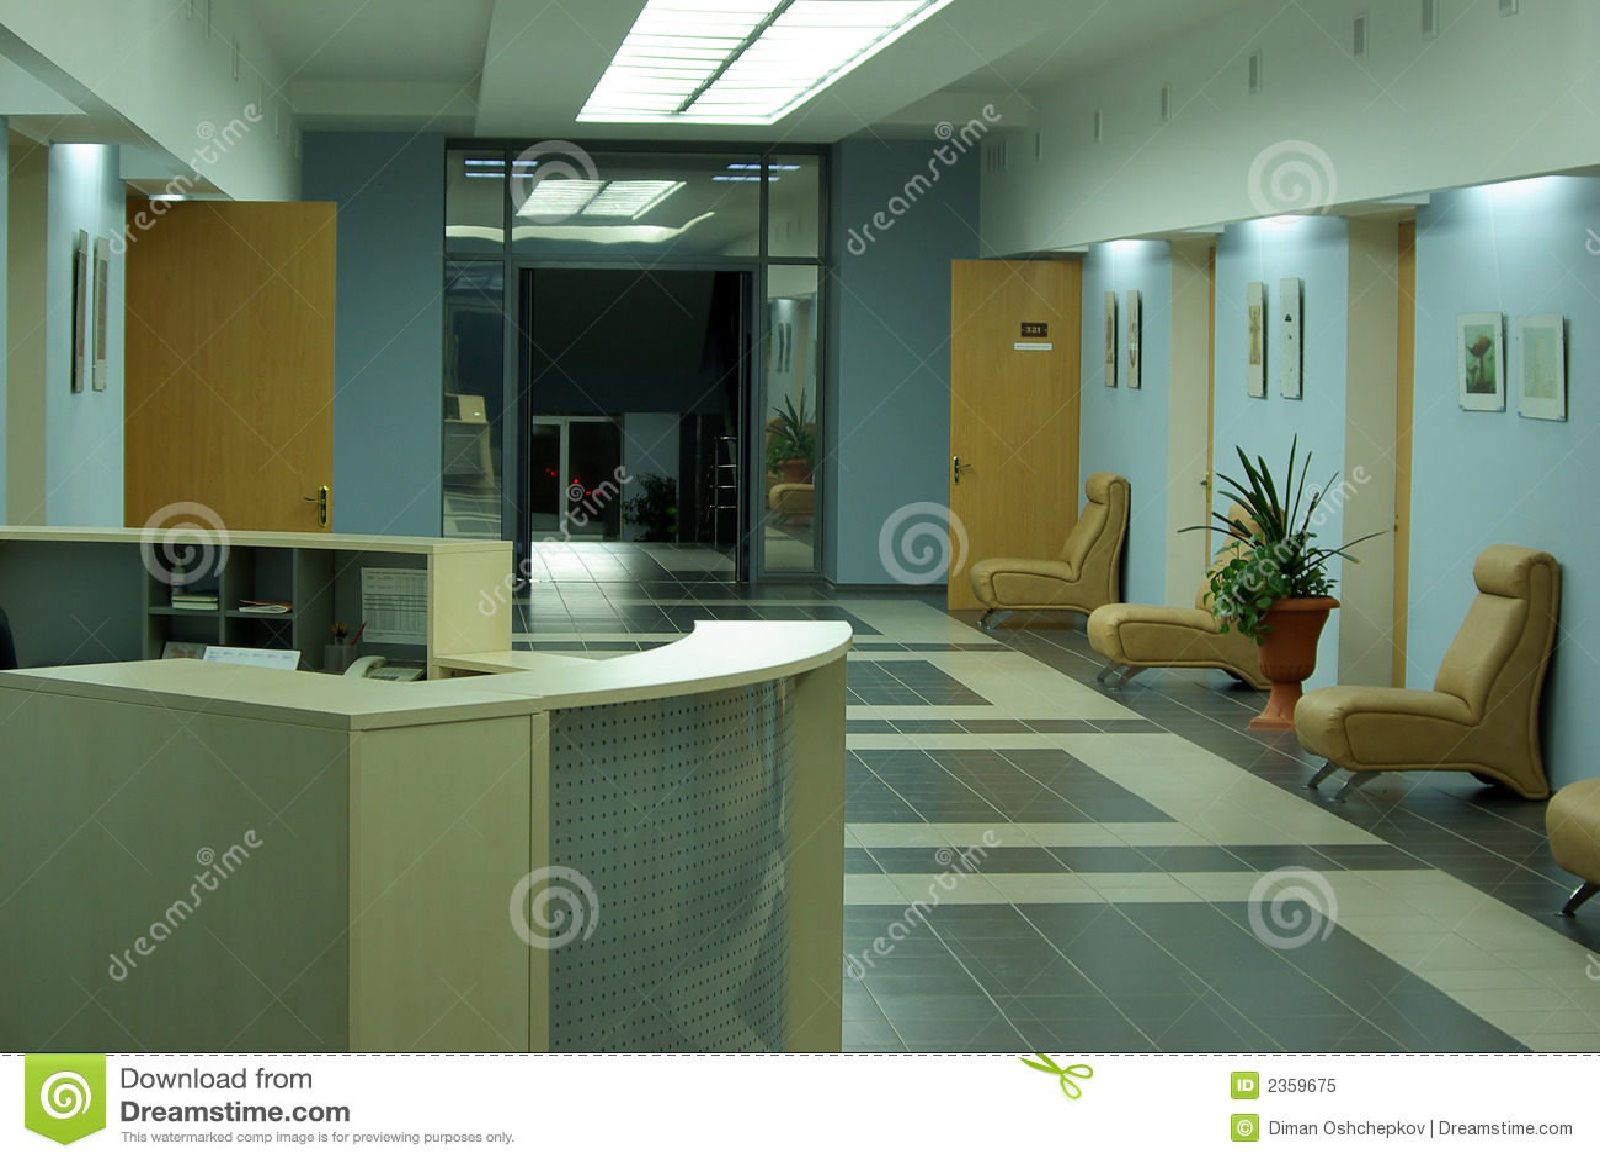 Affärskorridorinterior